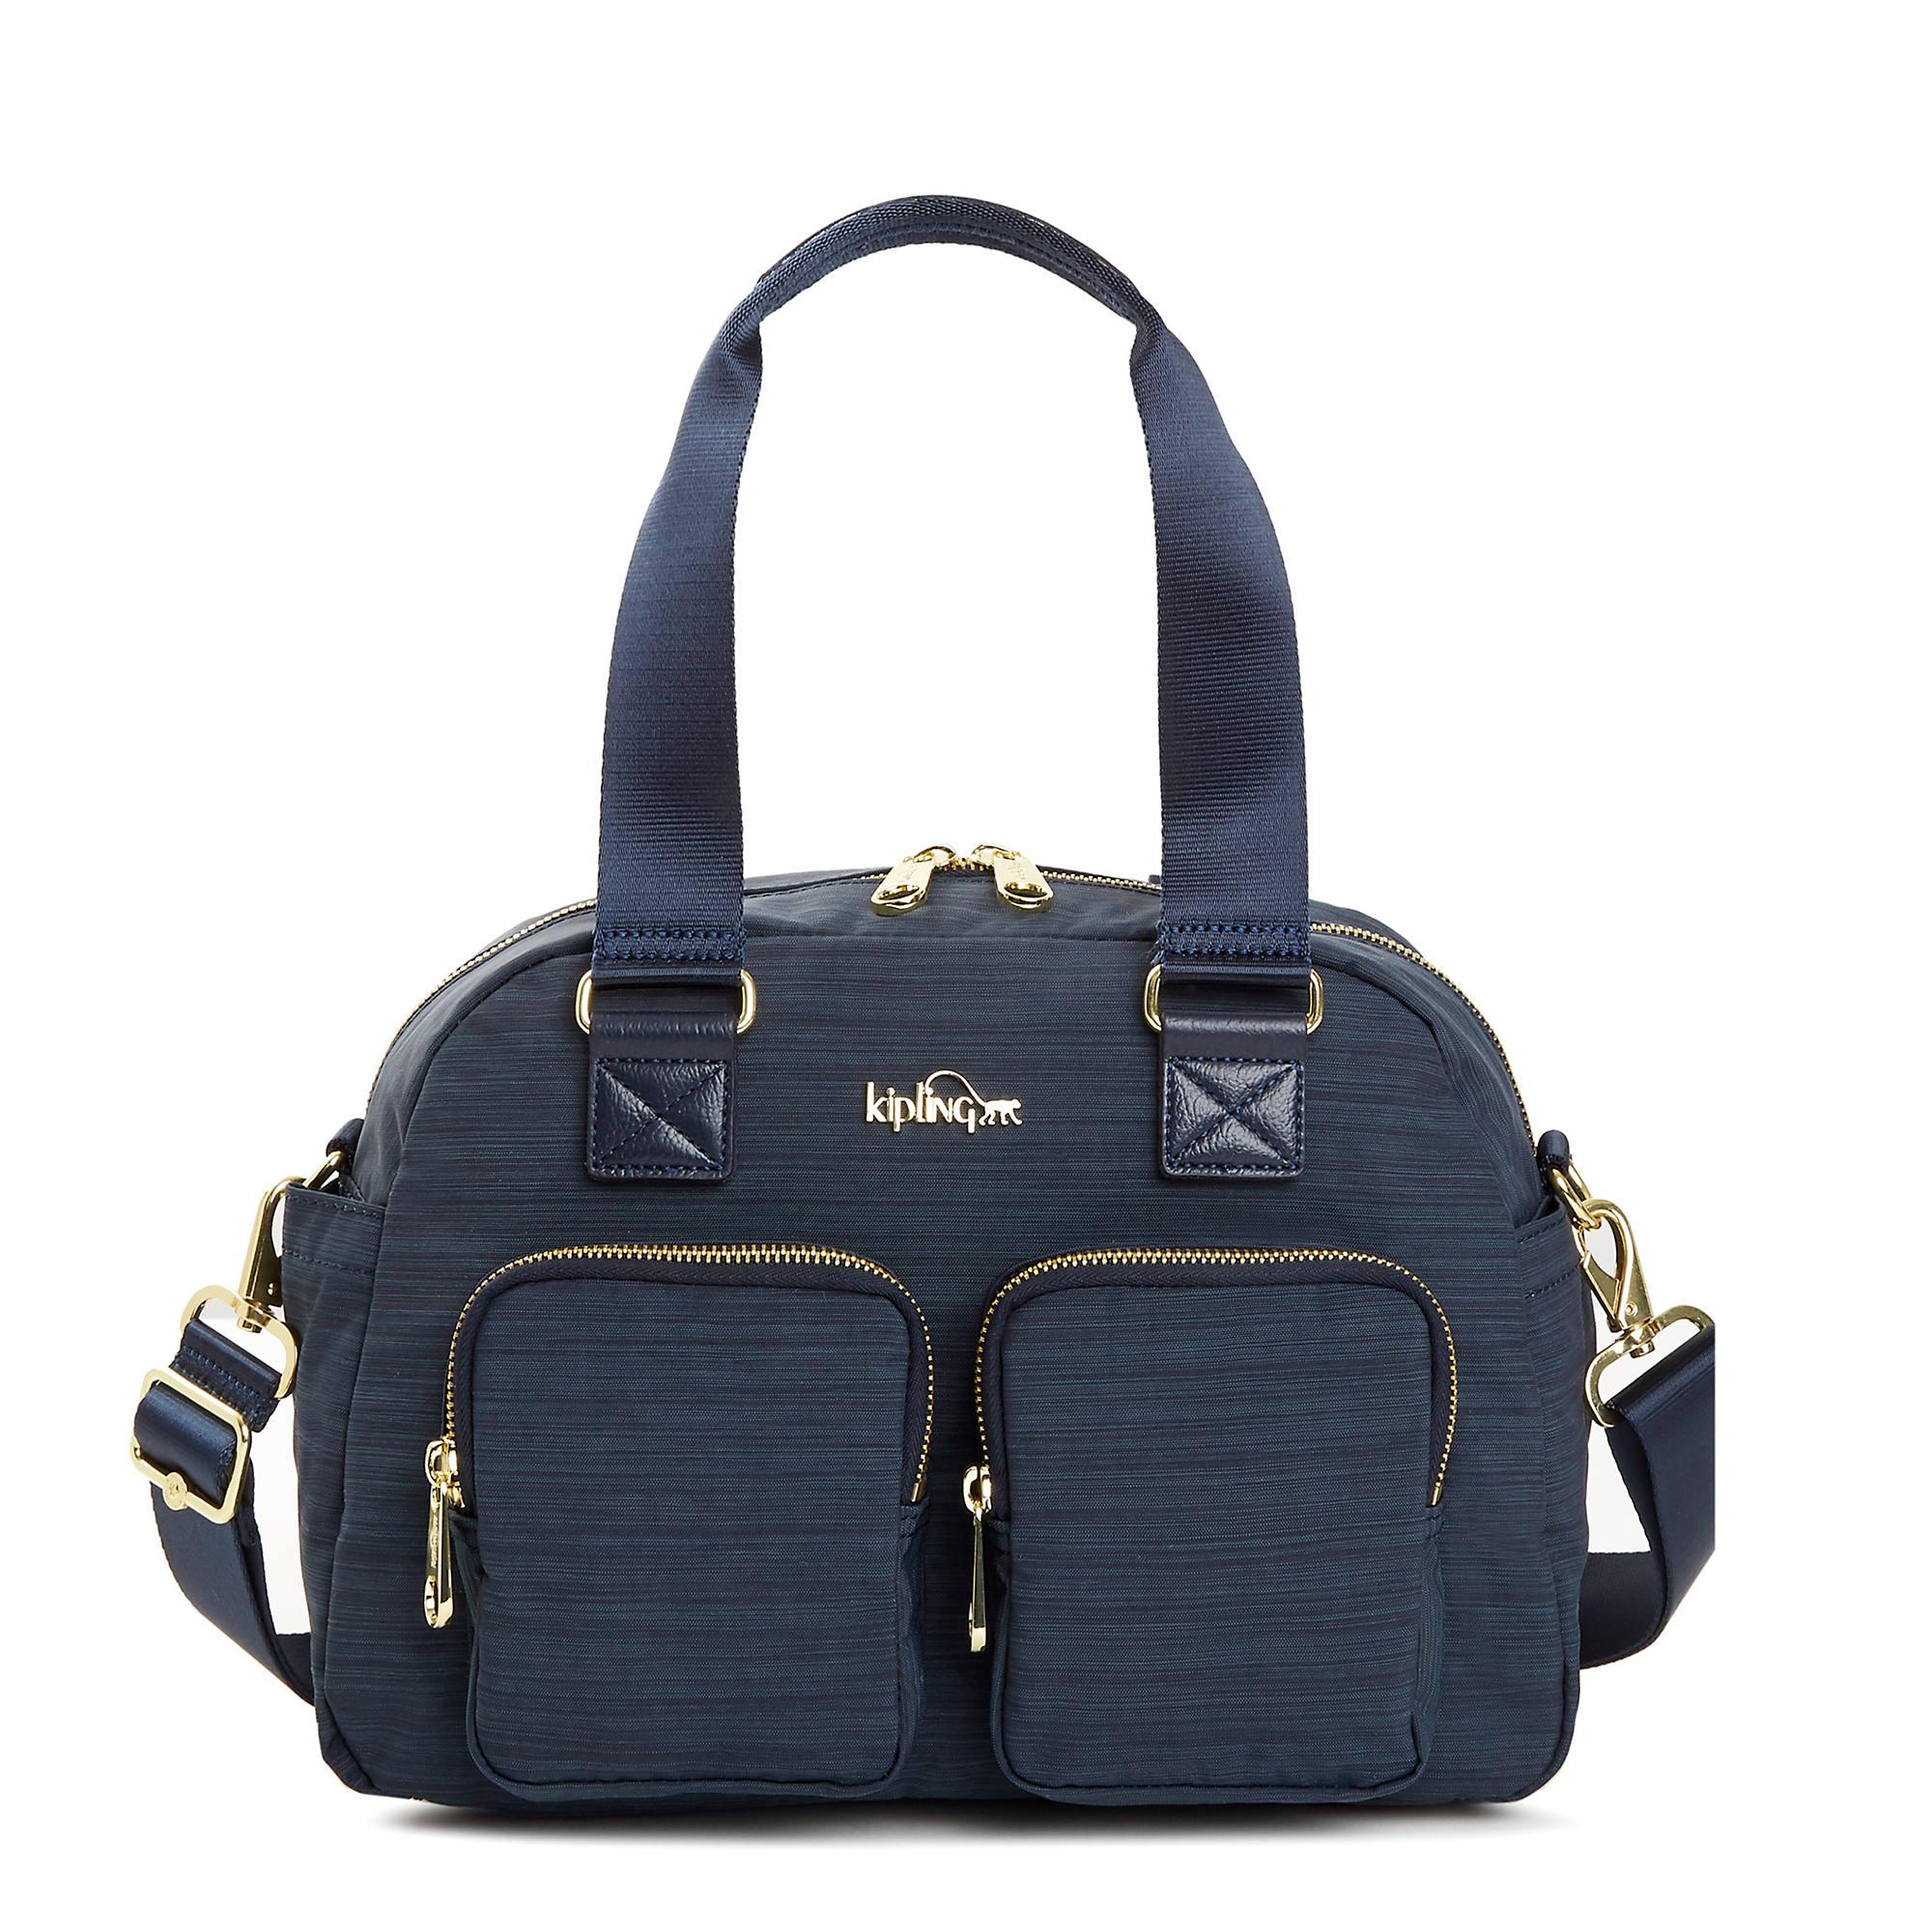 Defea Handbag Kipling Travel Bag In 6 1 Organizer Korean An Handbagtrue Dazz Navylarge